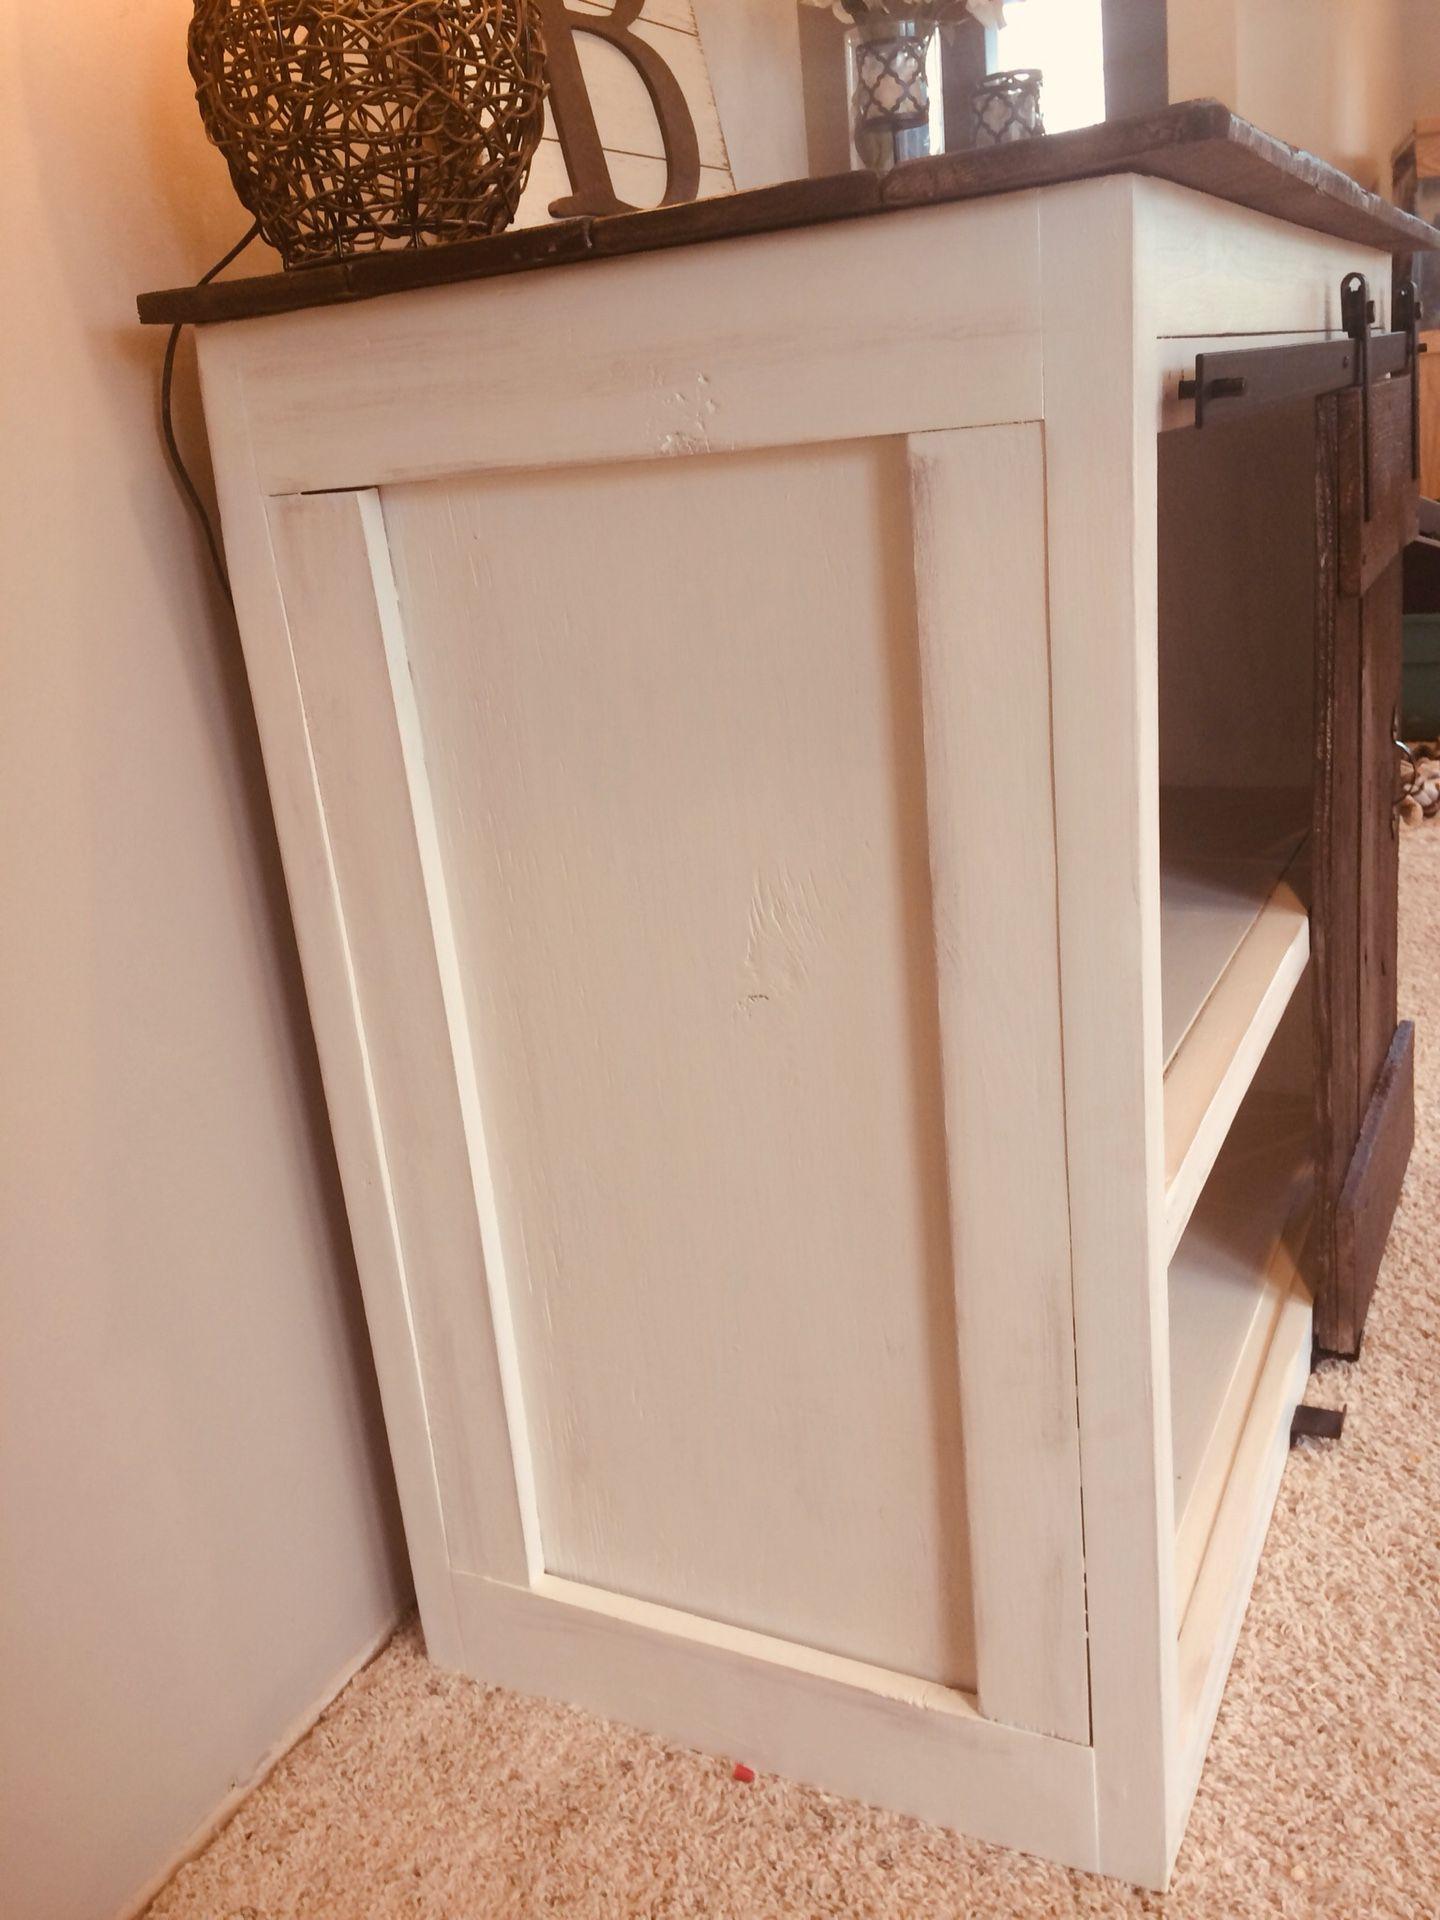 Rustic barn wood w/sliding barn wood door entertainment center/vanity/dresser/extra storage